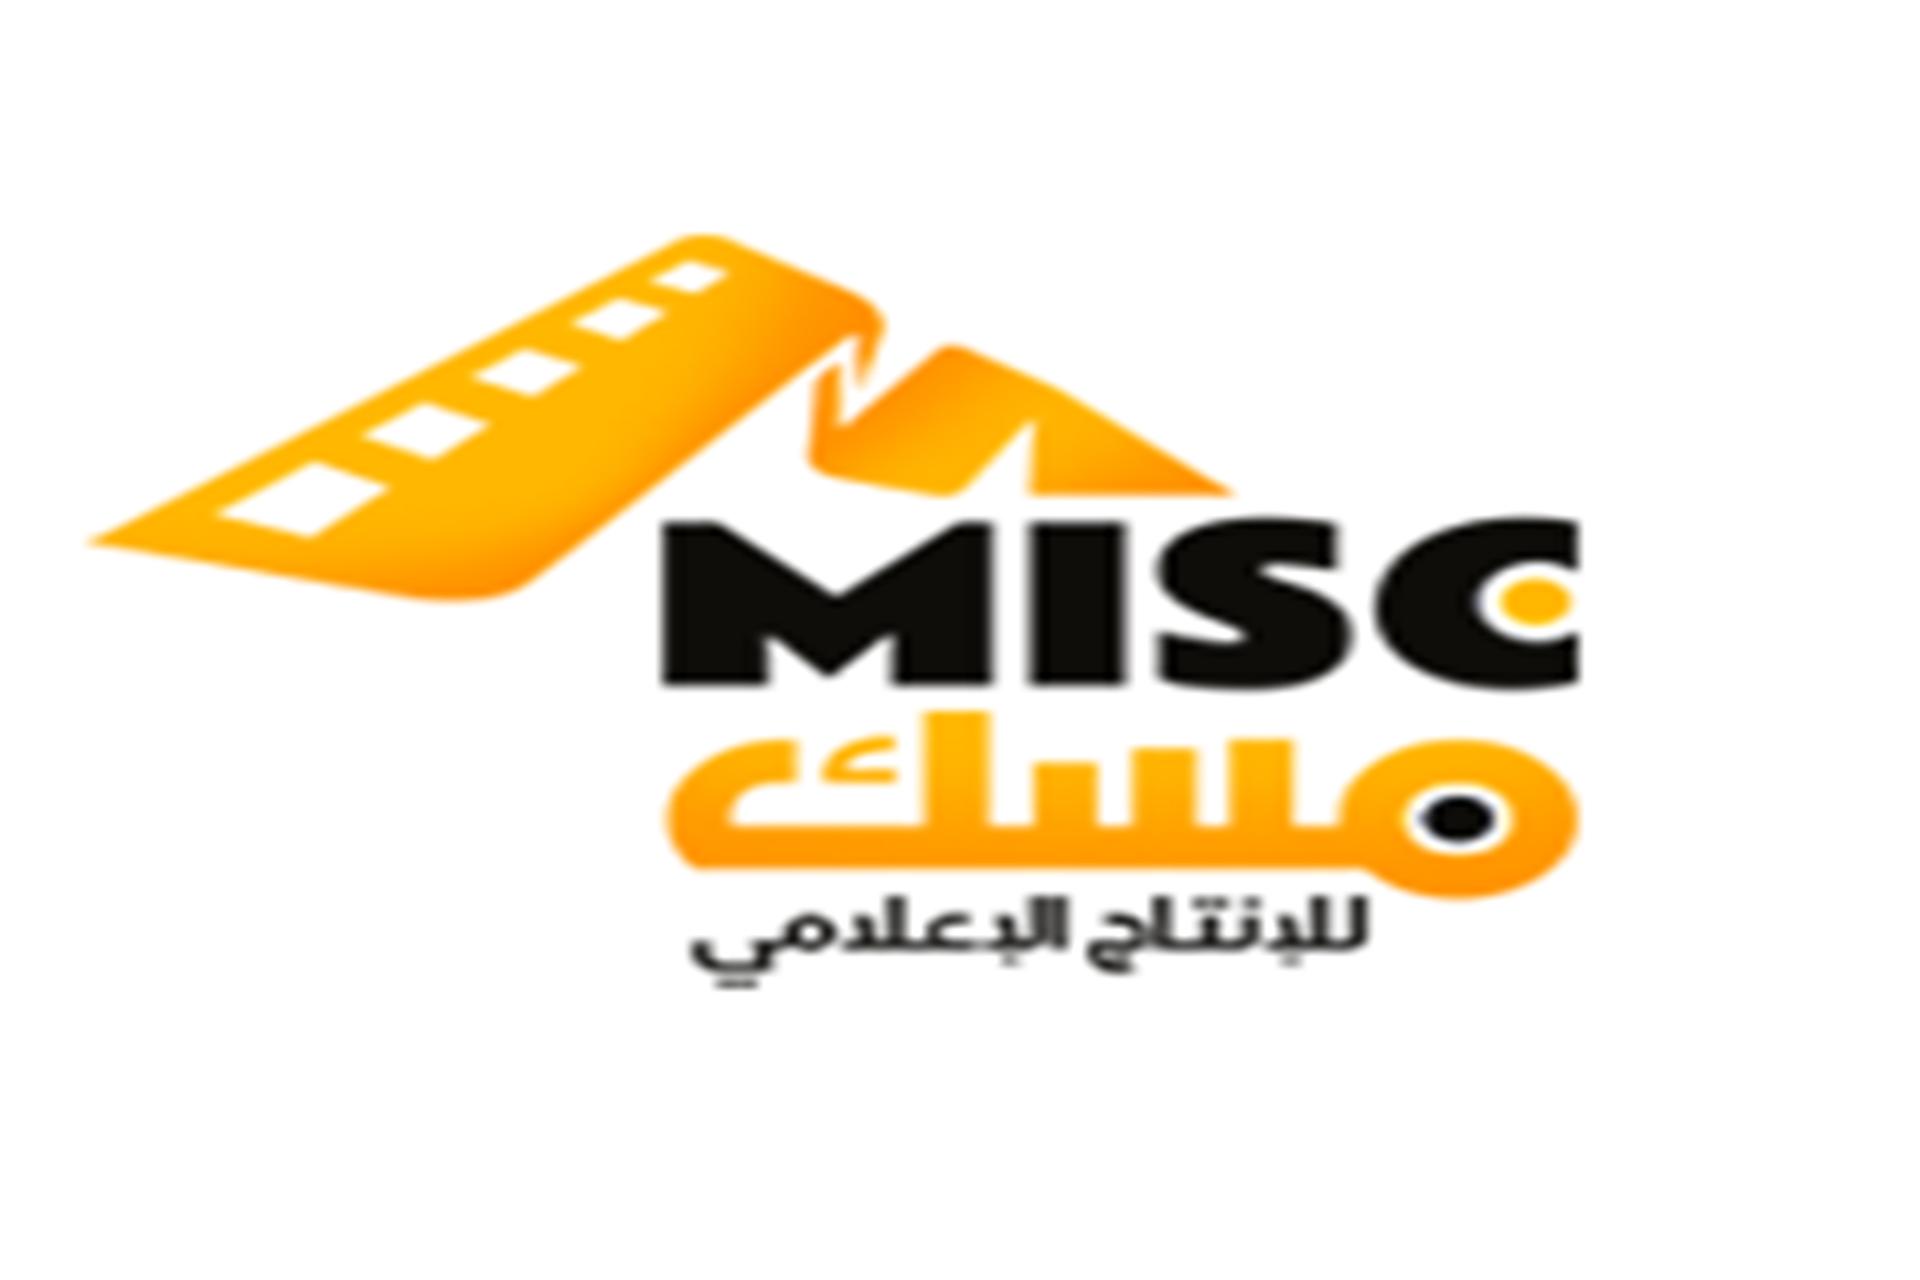 misc_egypt